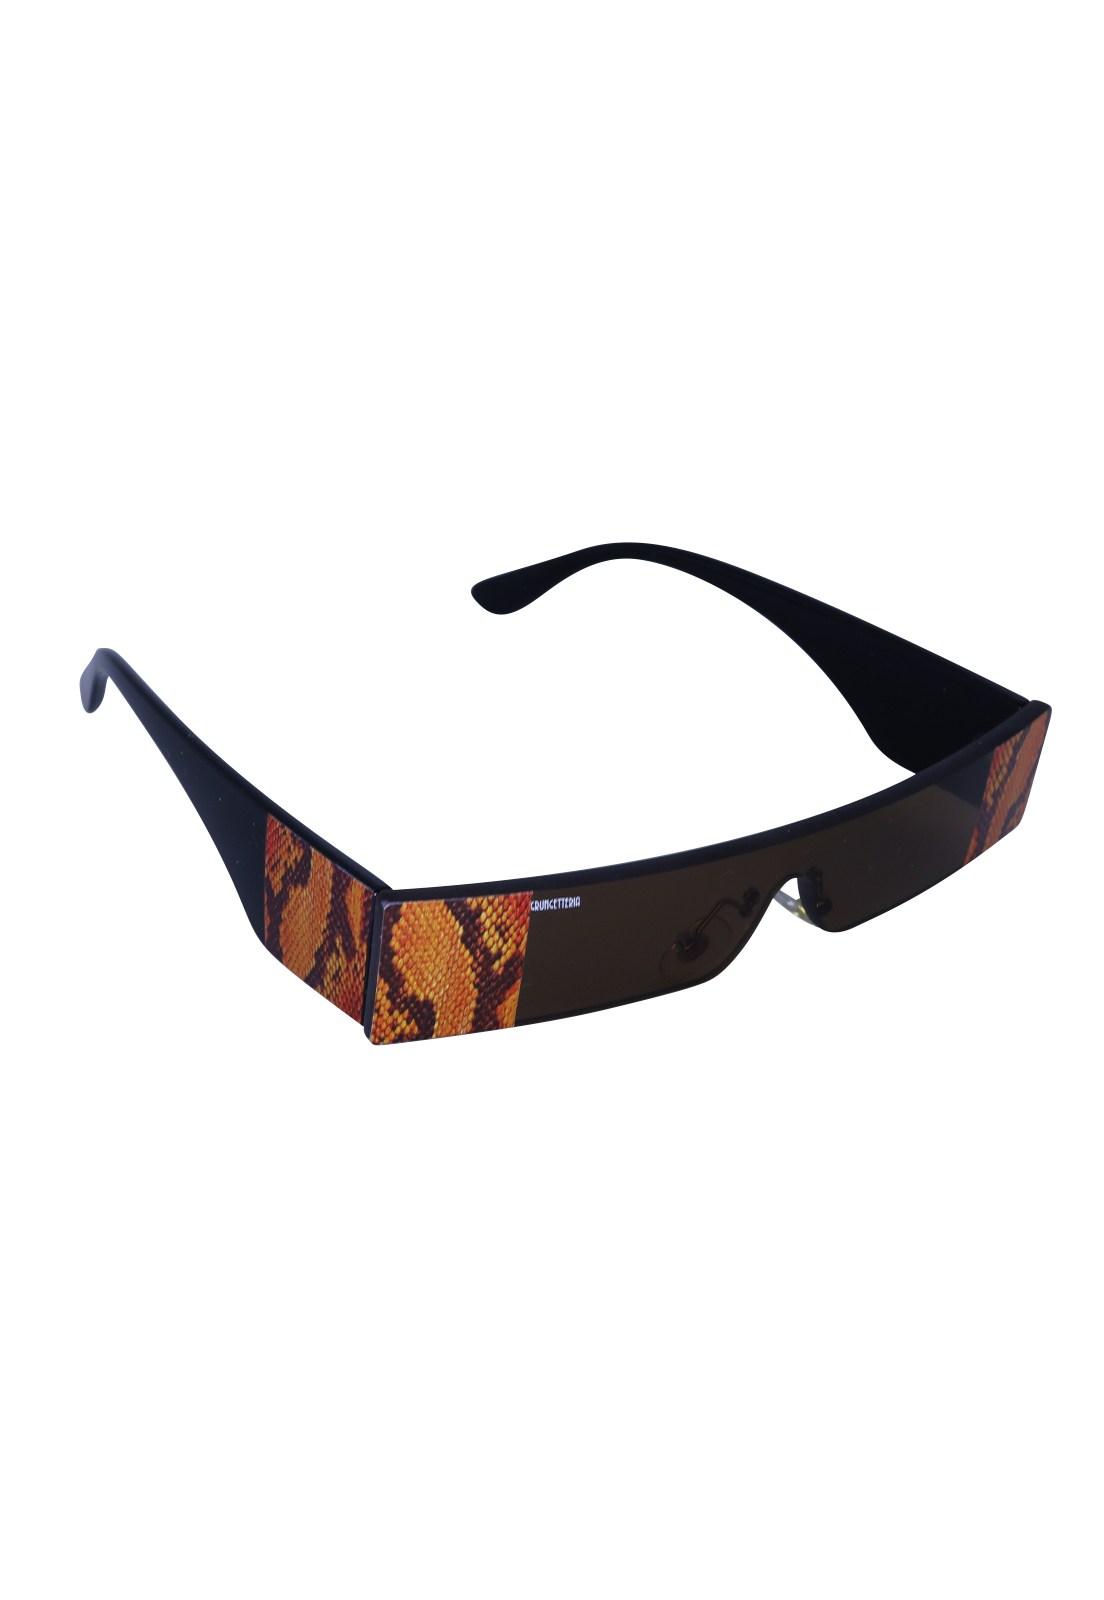 Óculos de Sol Grungetteria Wild Laranja